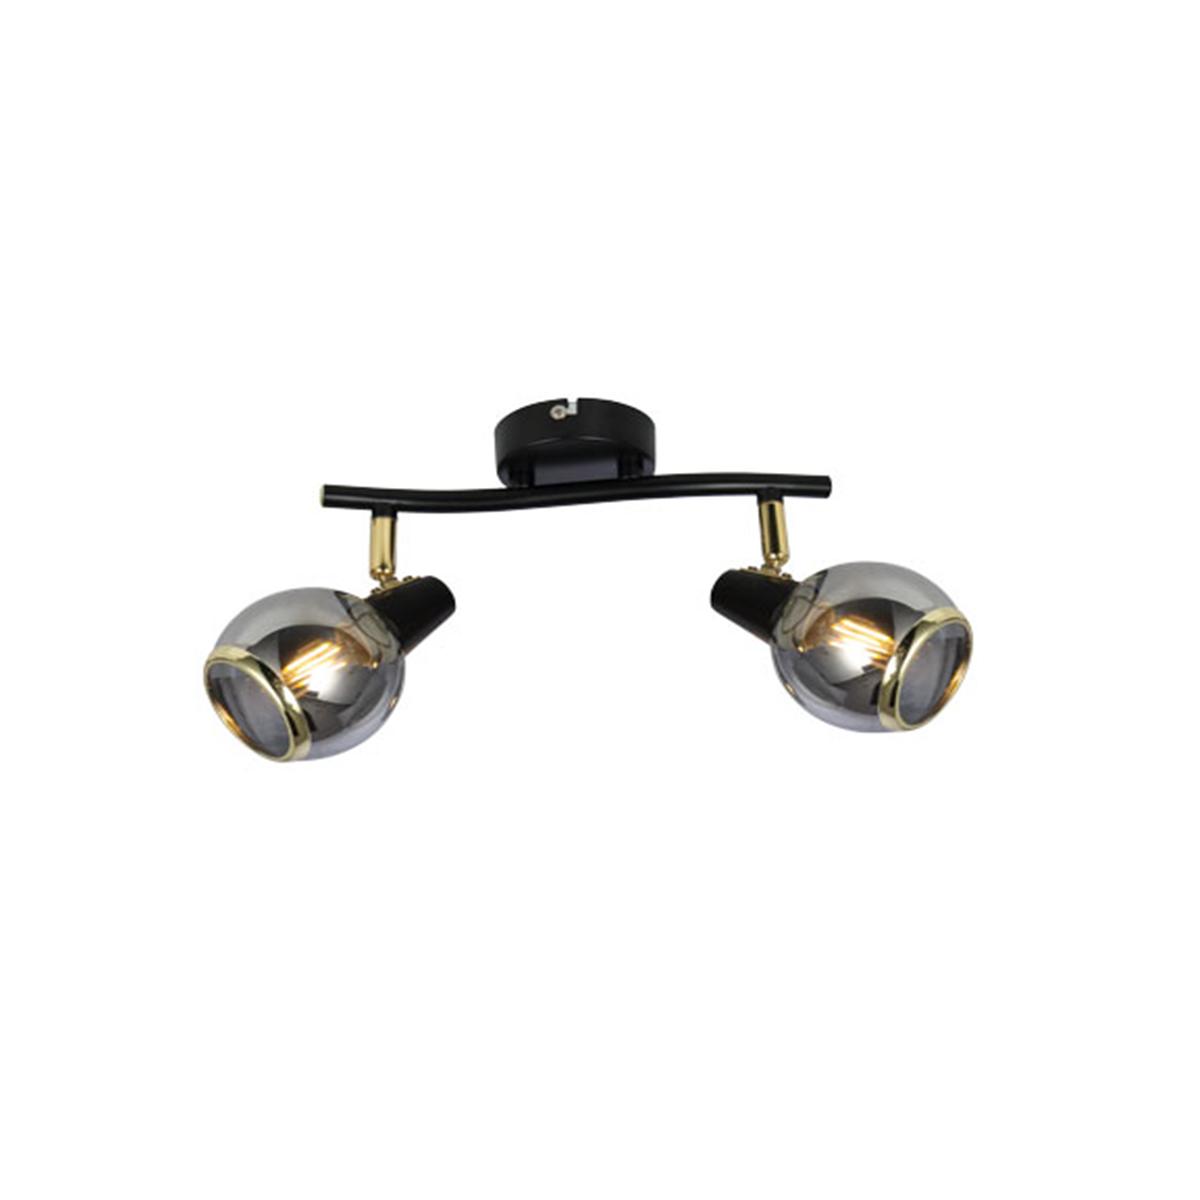 Spot lampa Iskra/2 6602047